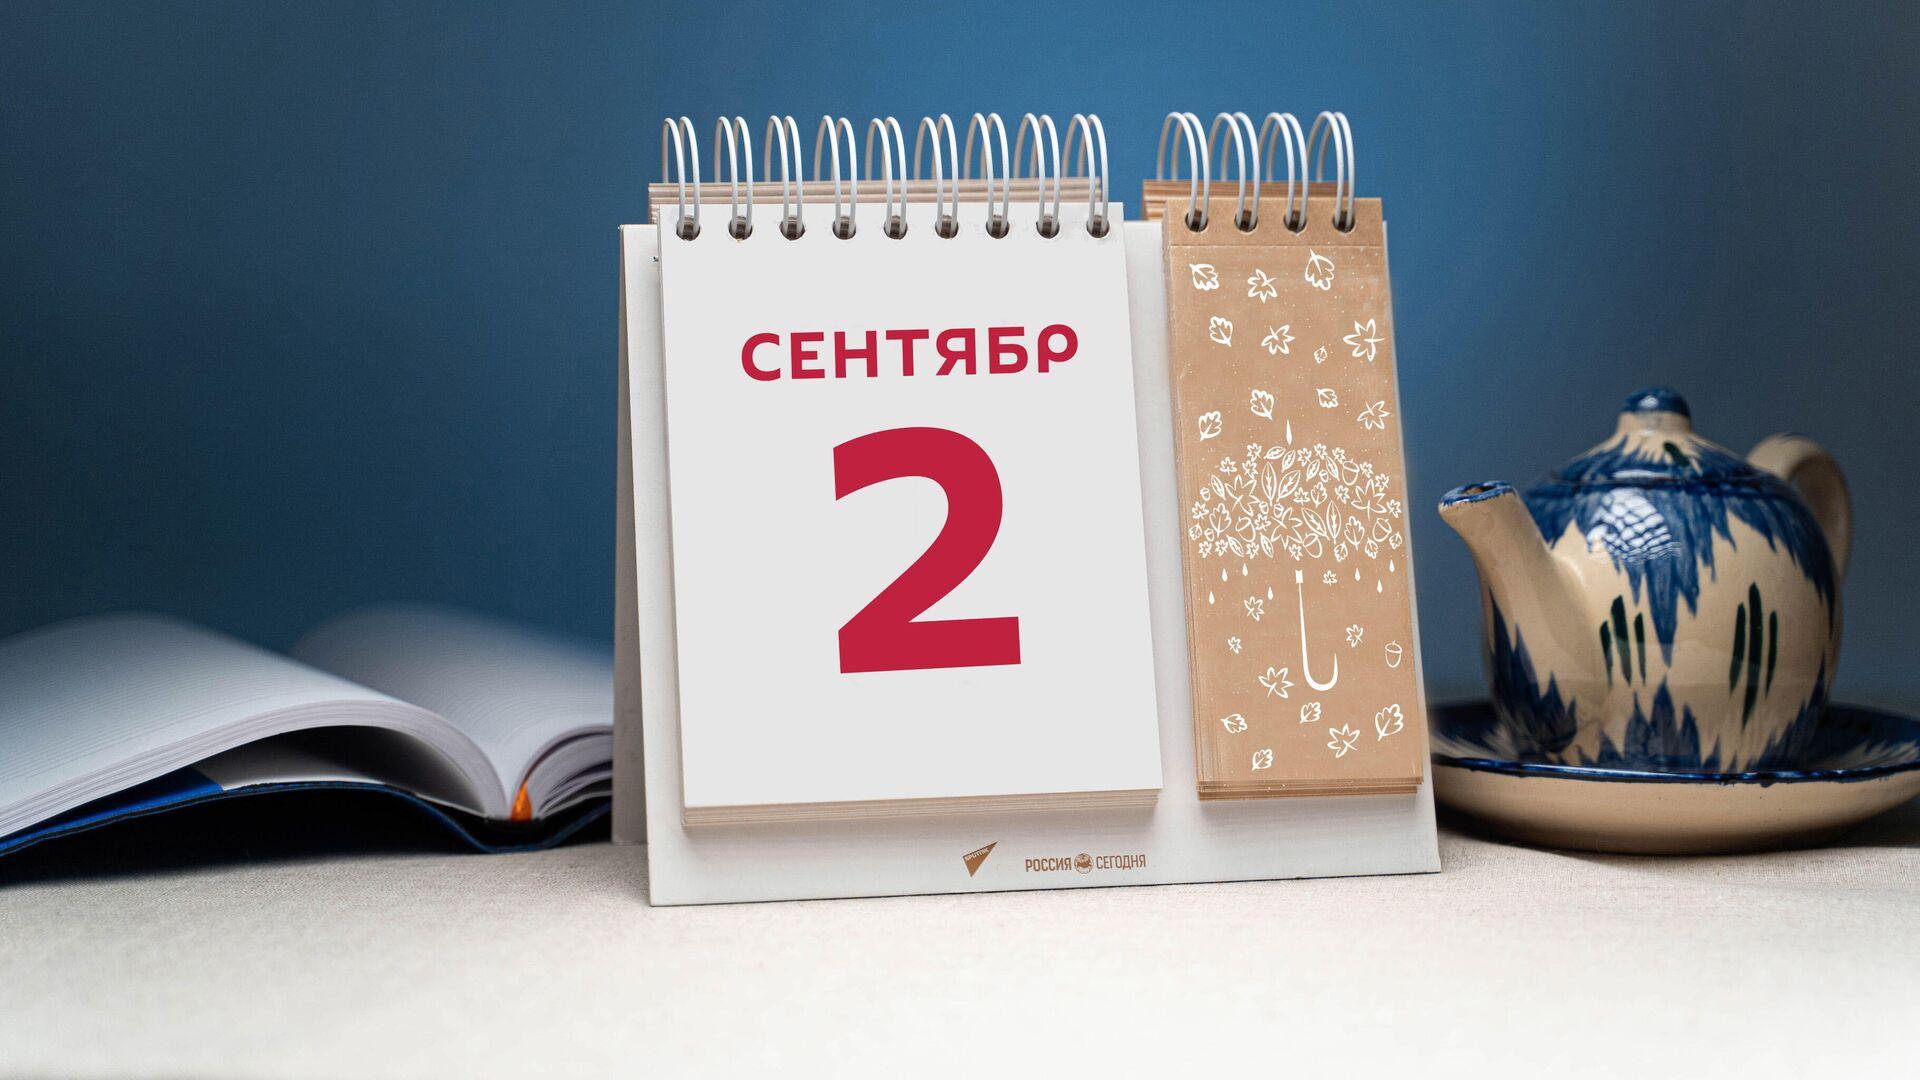 День 2 сентября - Sputnik Тоҷикистон, 1920, 02.09.2021